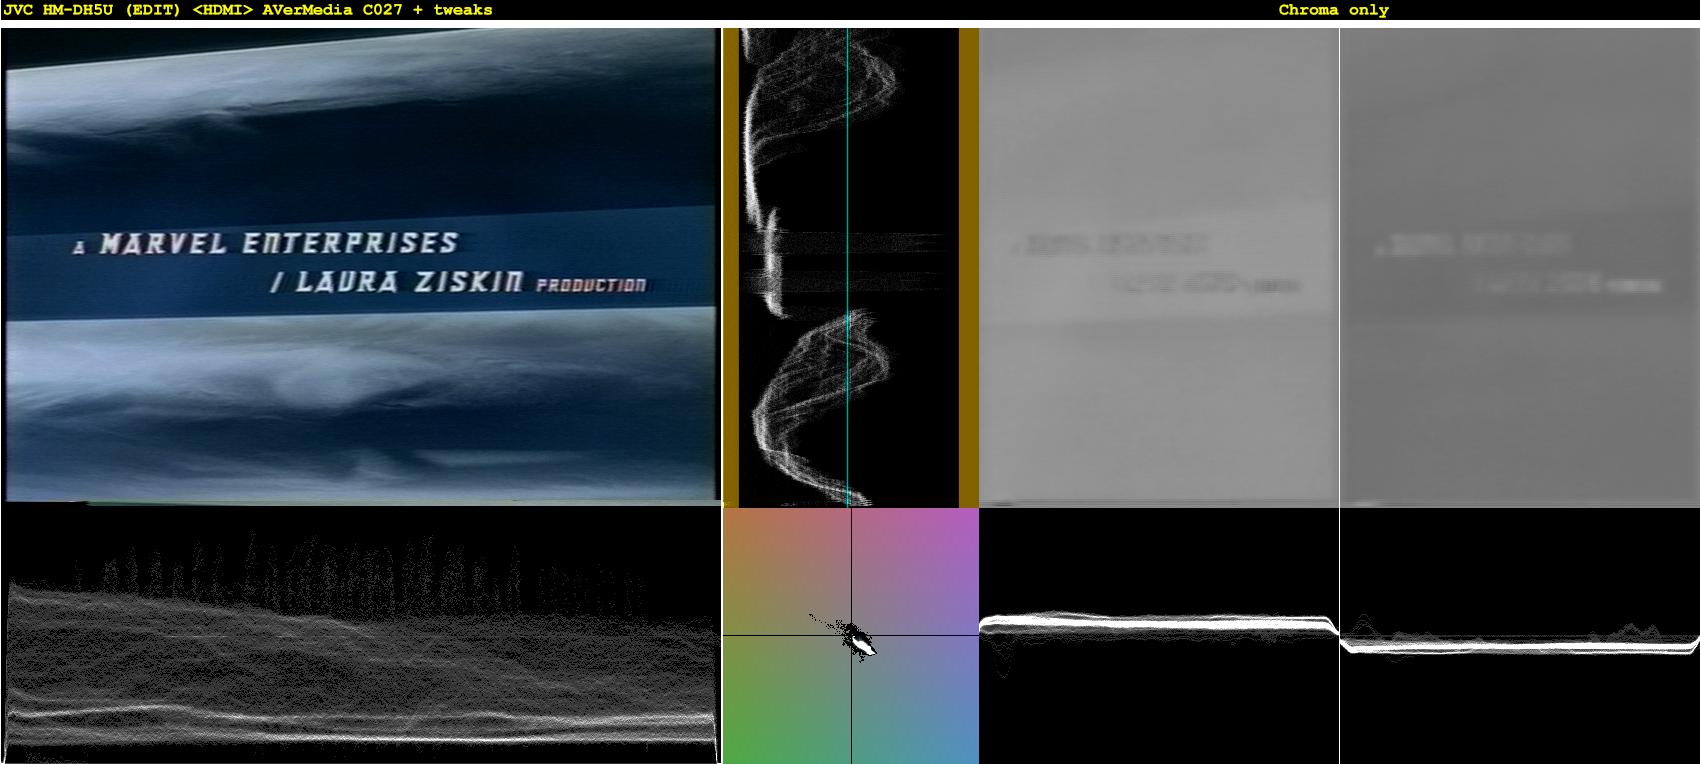 Click image for larger version  Name:0-09-01 - JVC HM-DH5U (EDIT).png Views:1287 Size:818.6 KB ID:37666